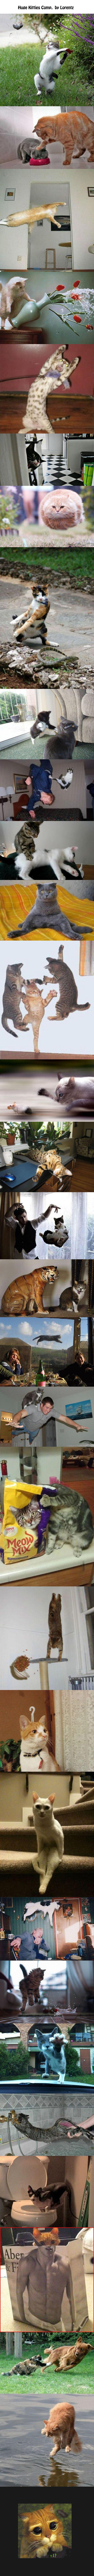 Huge Kitties Compilation. OC .. No monorail cat ? kitties comp